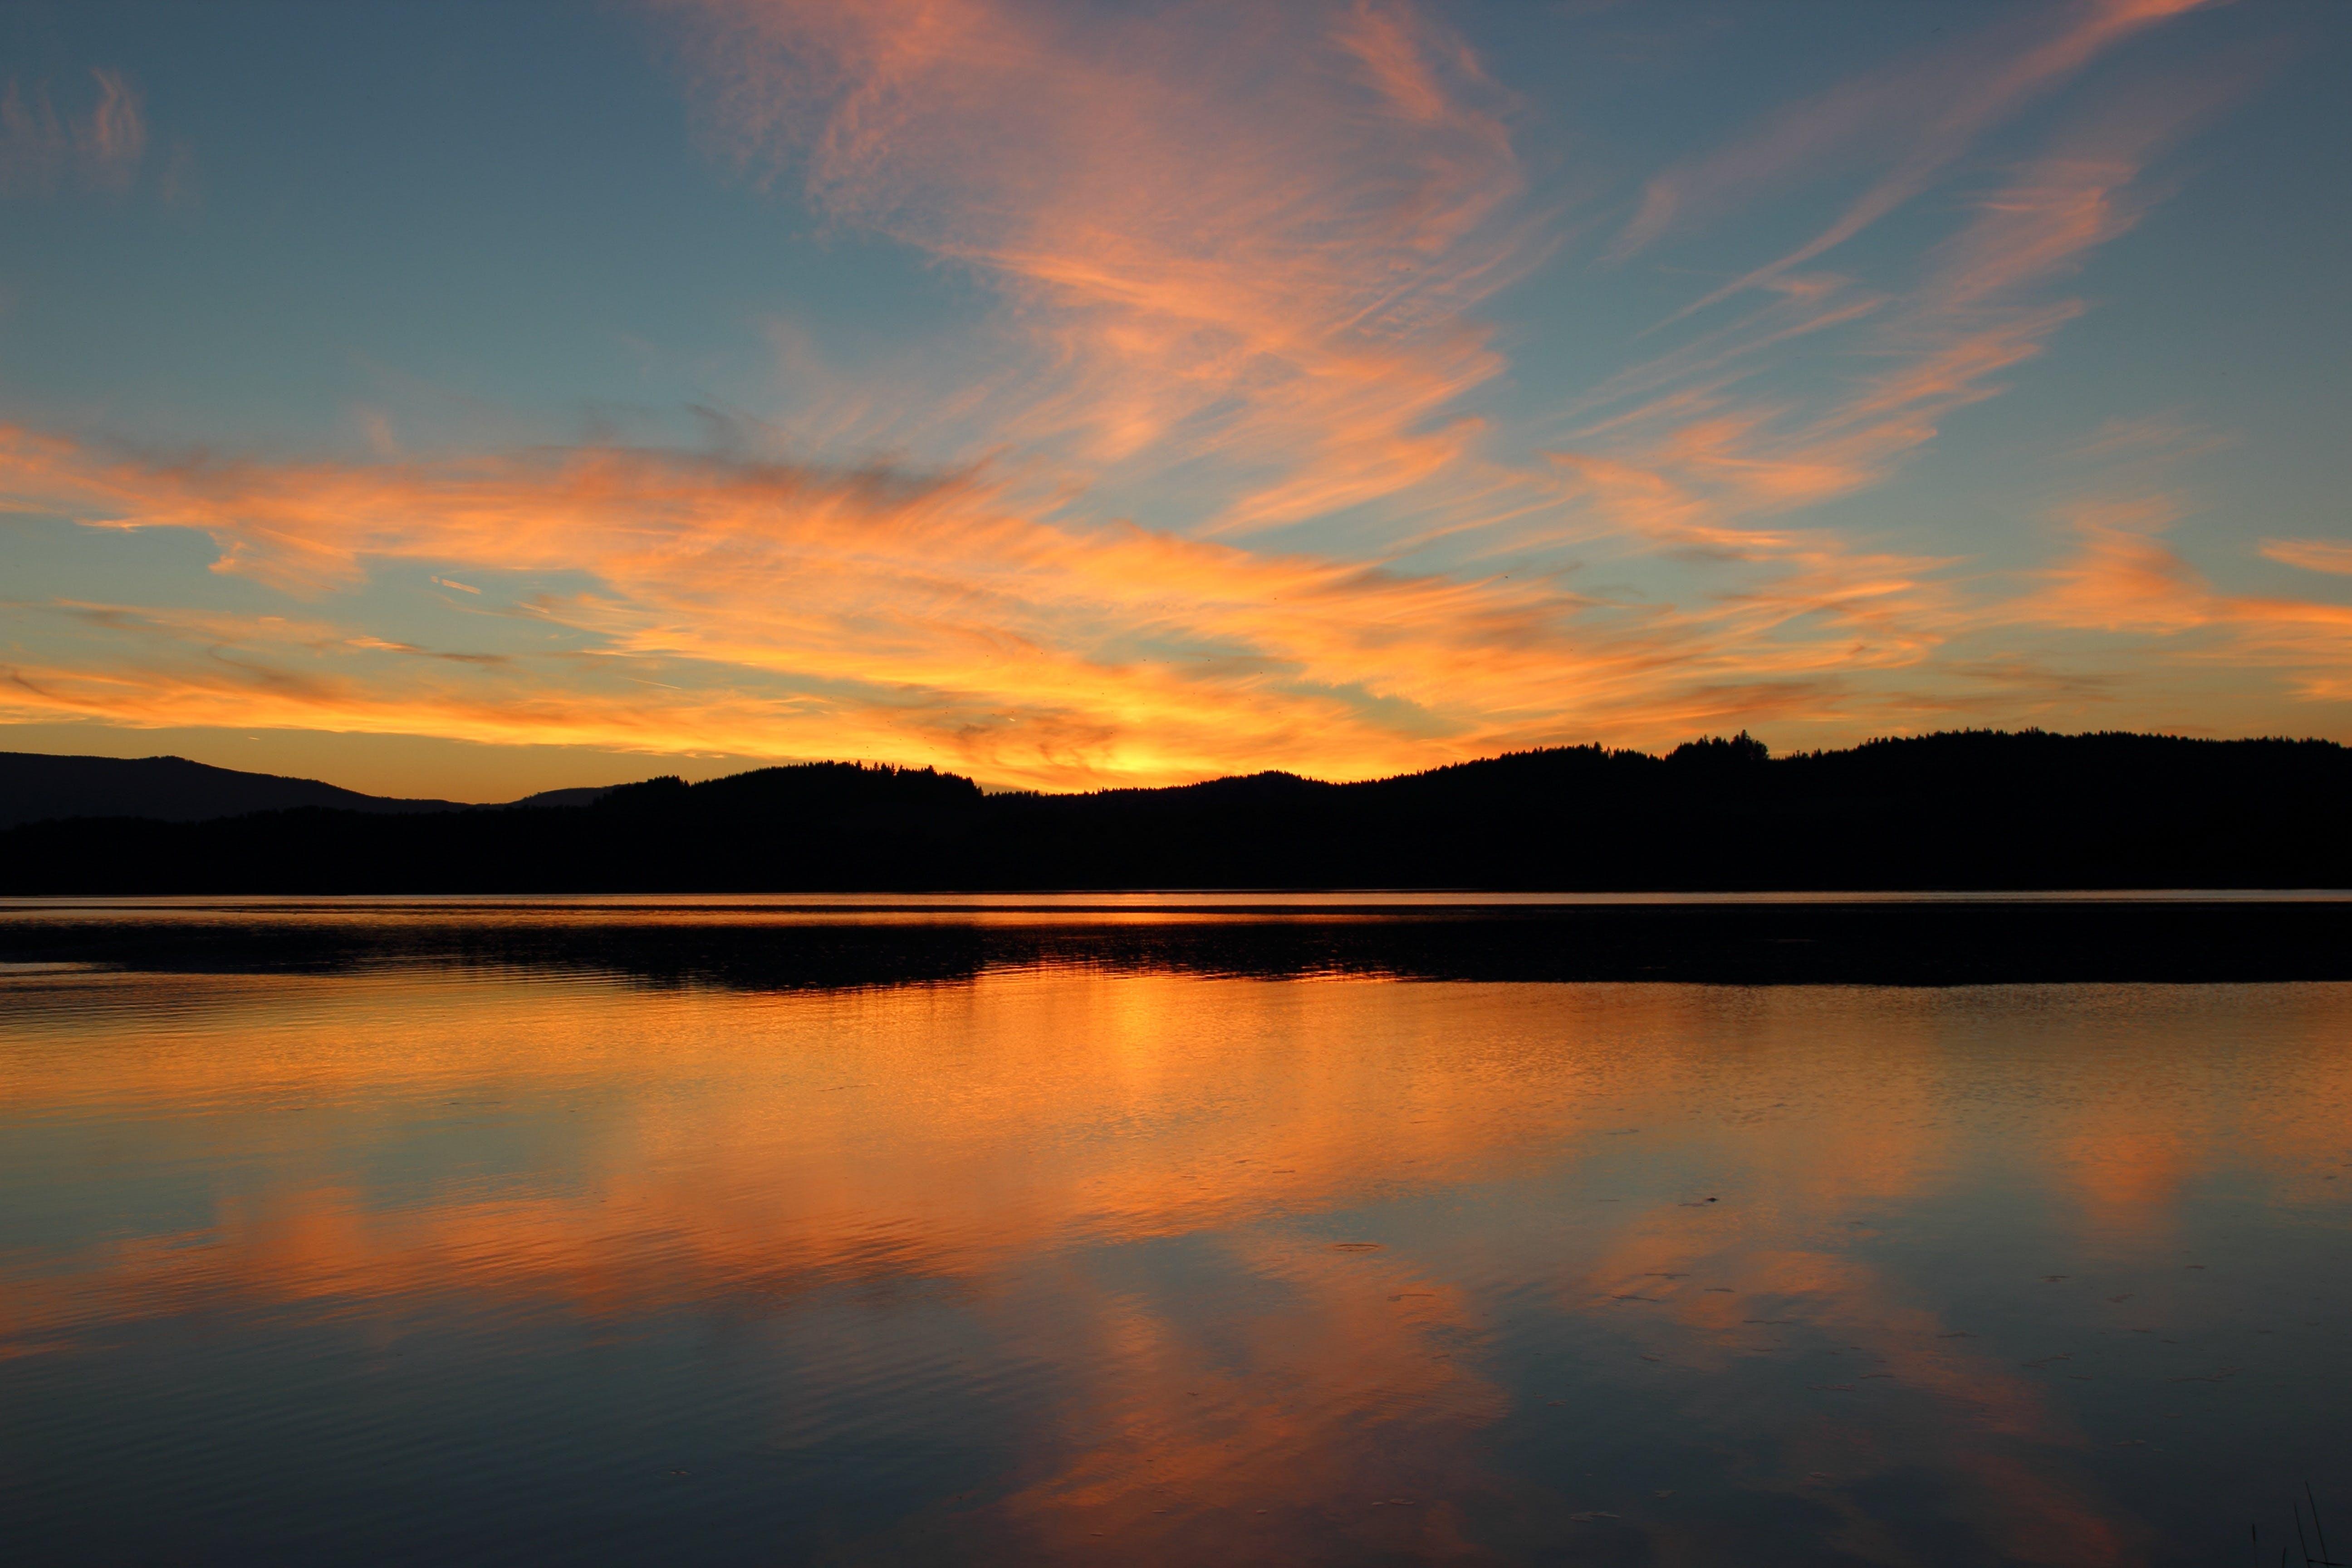 Gratis stockfoto met dageraad, h2o, hemel, natuur